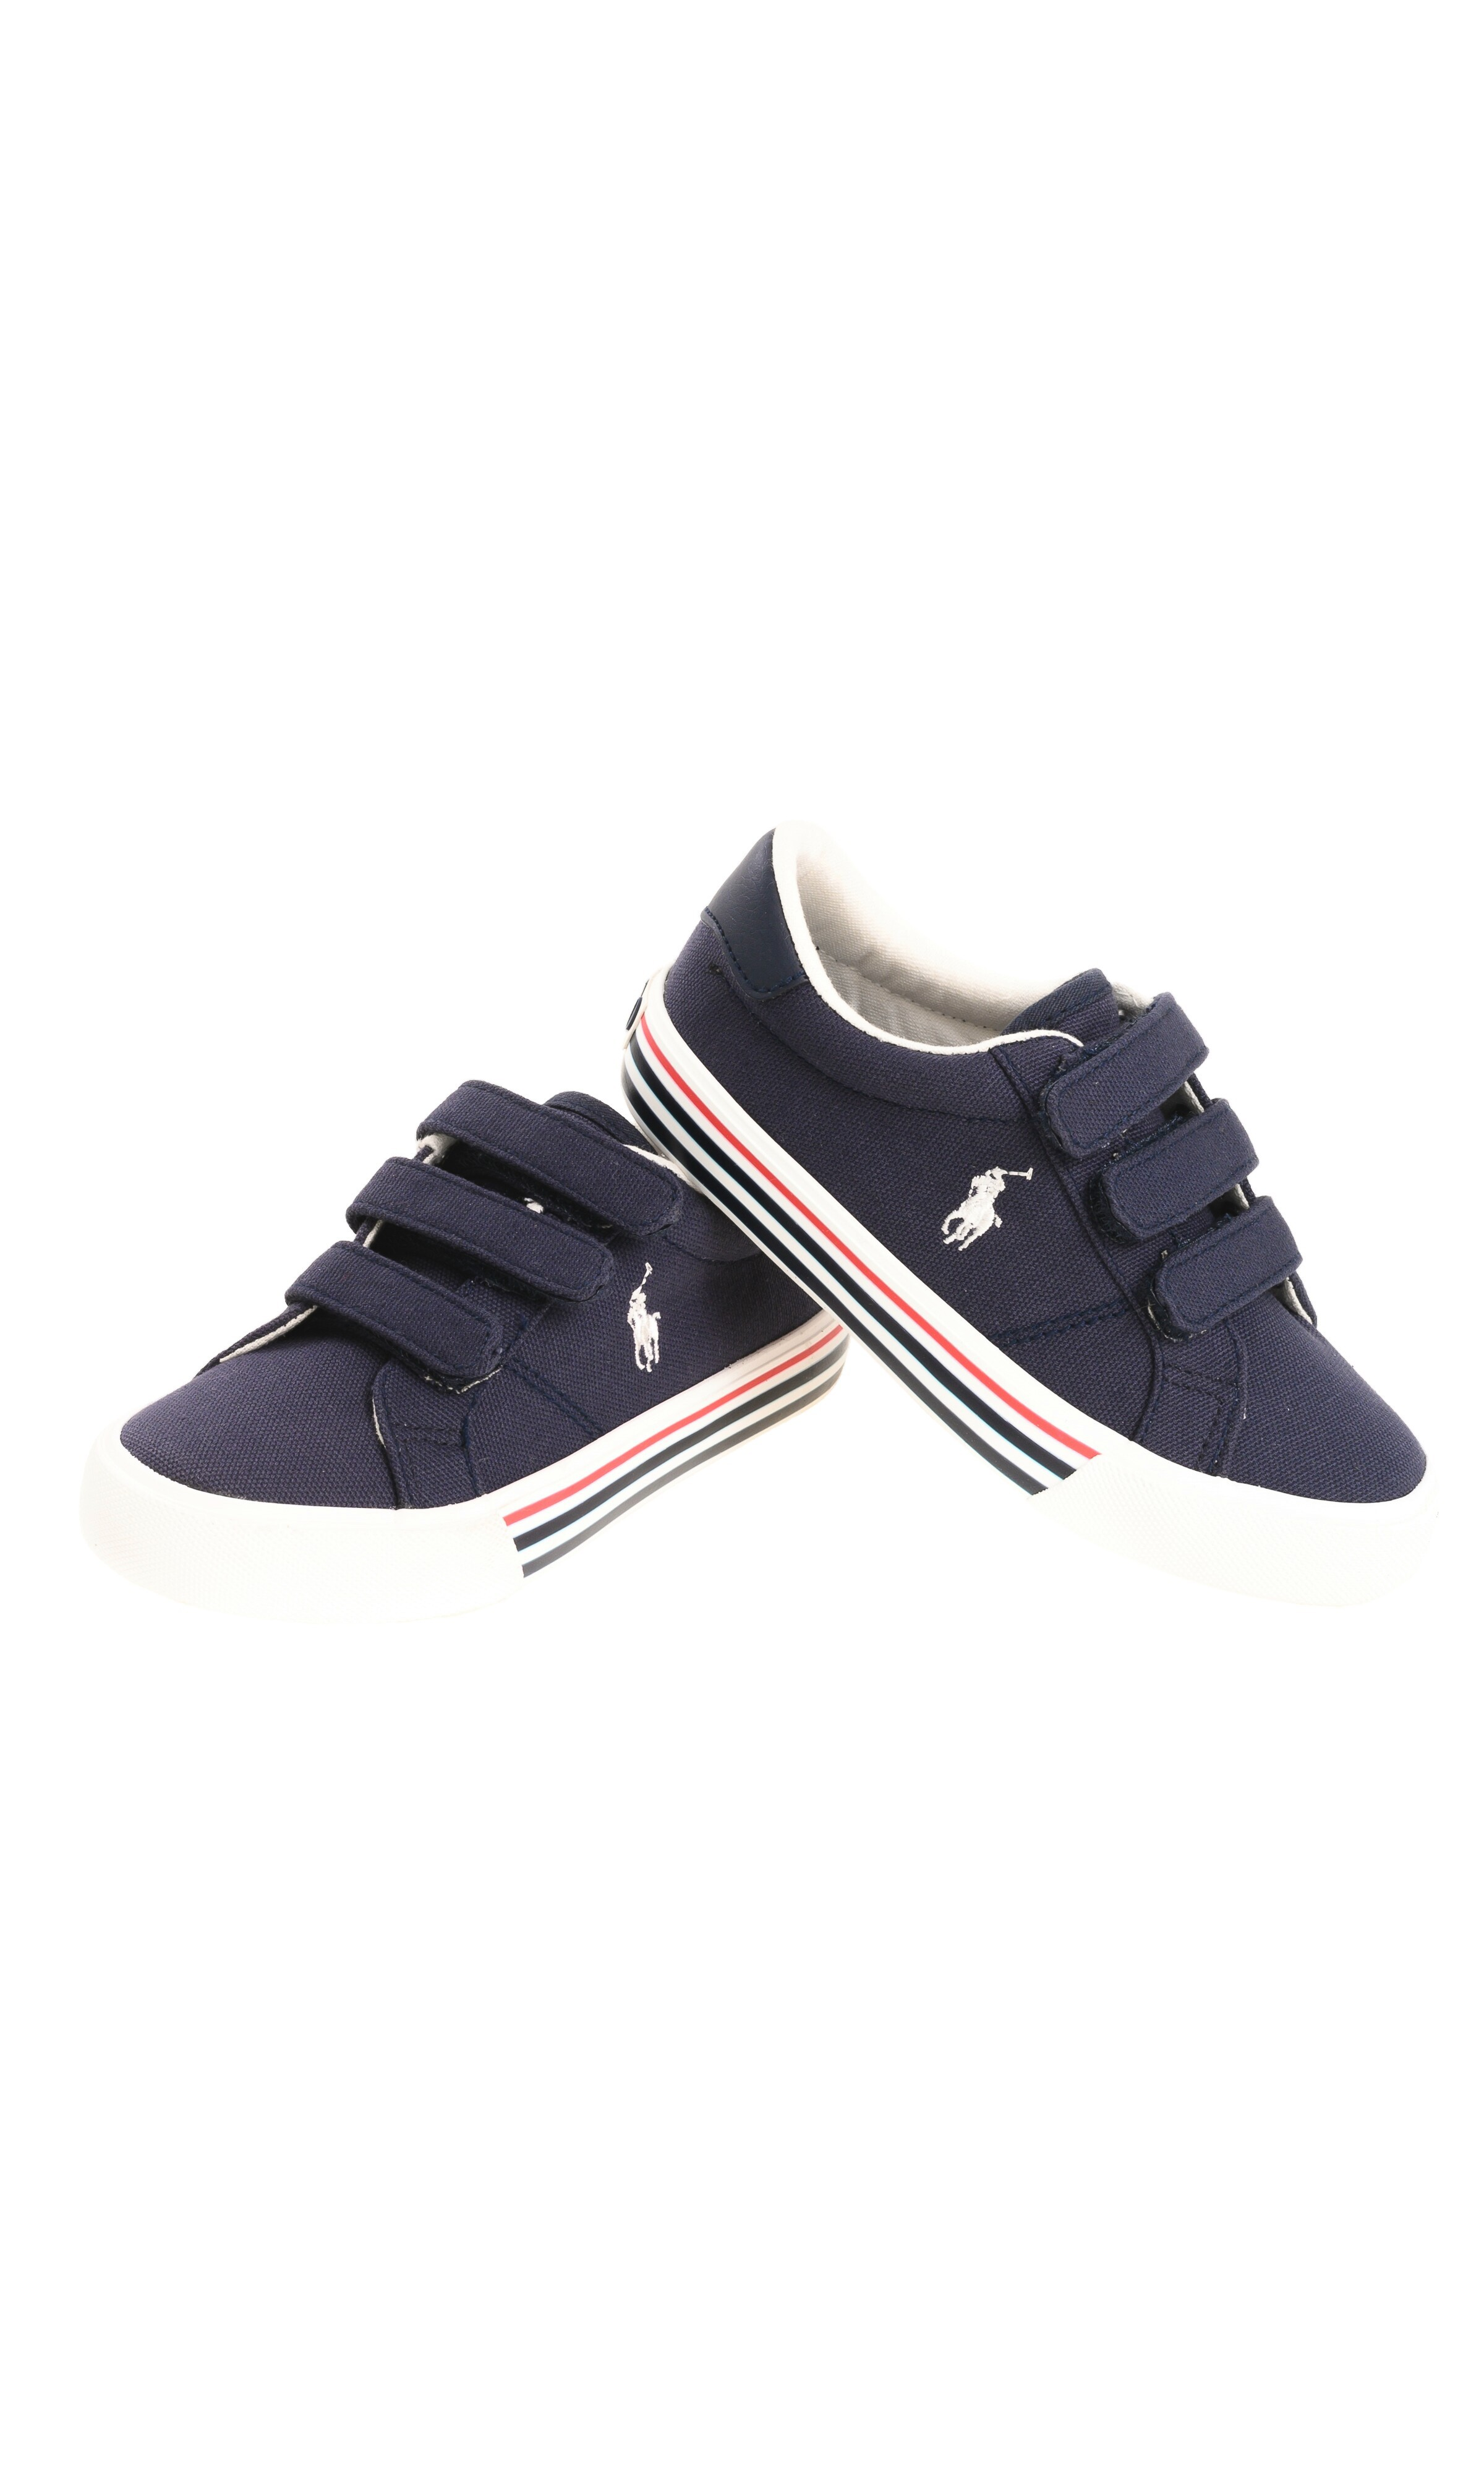 Blue navy kids Velcro sneakers, Polo